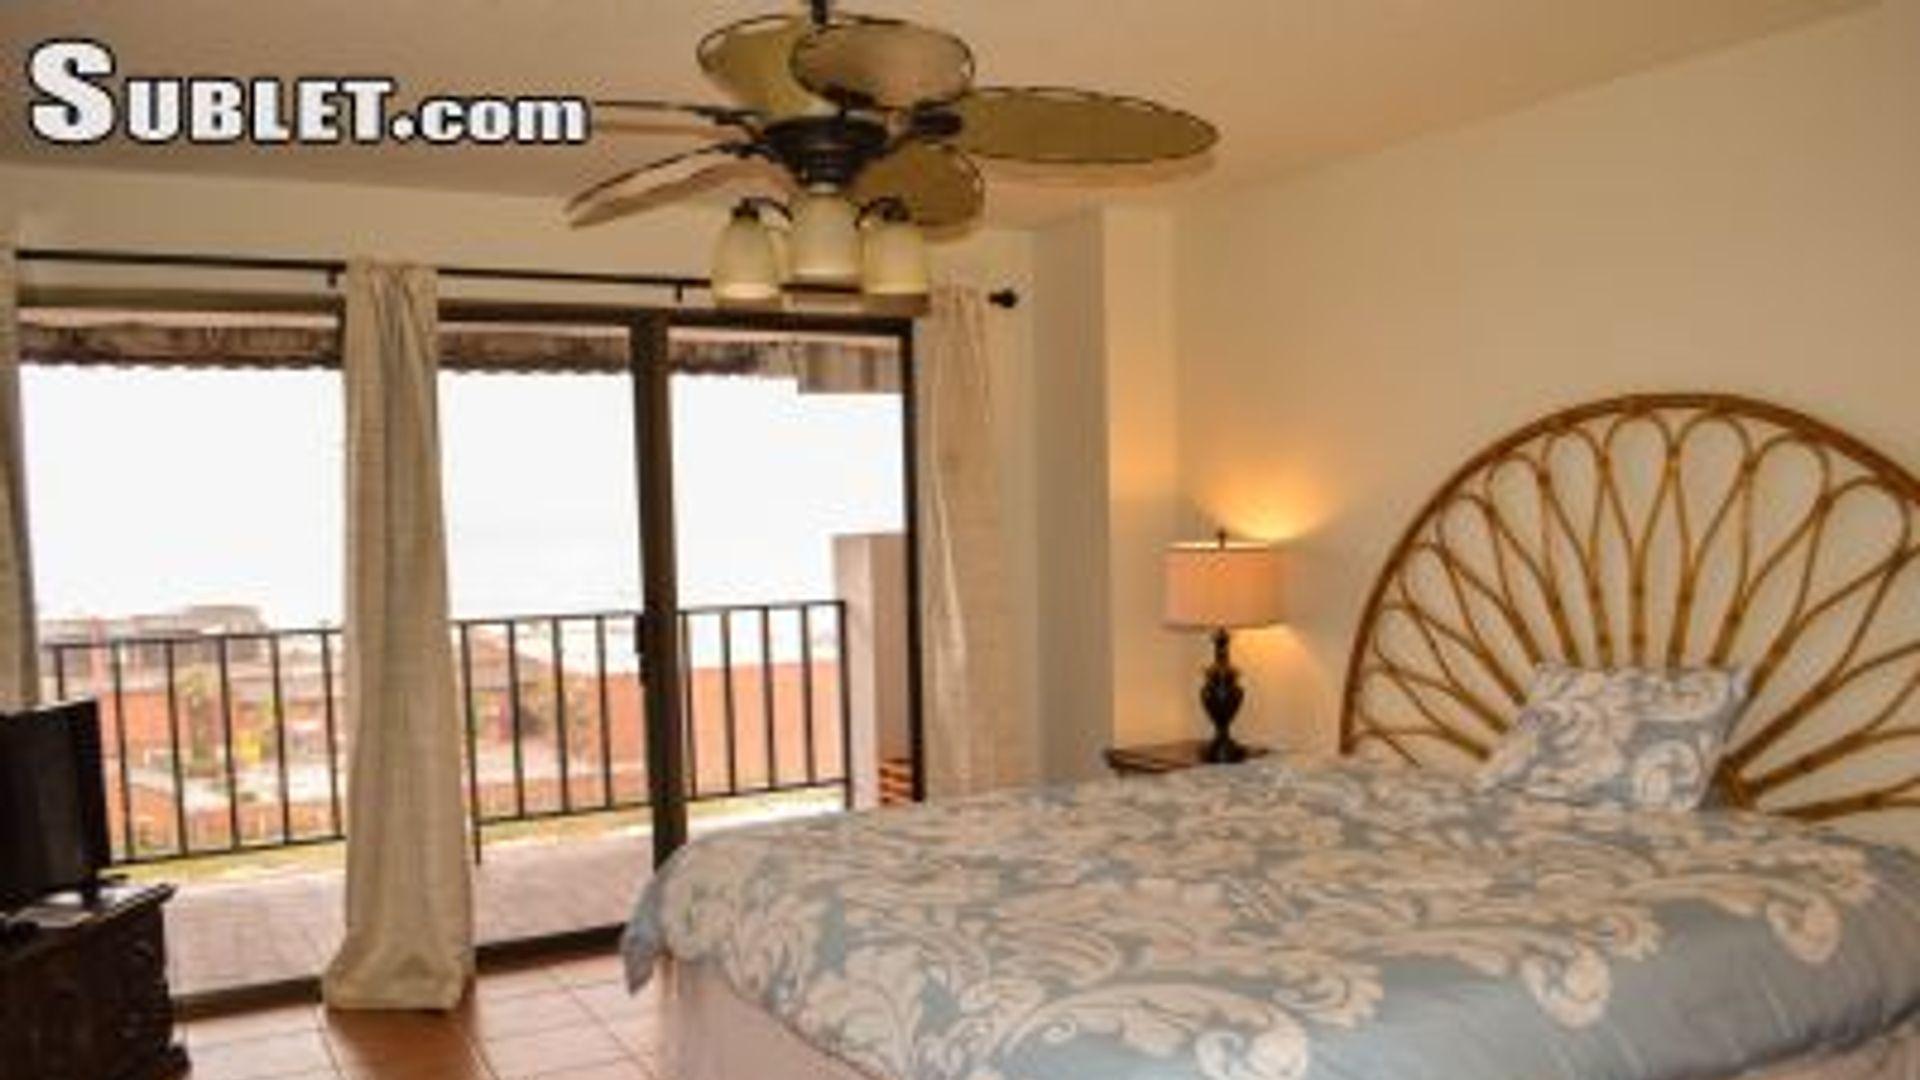 2 bedroom apartment at Las quintas, Boulevard Benito ...